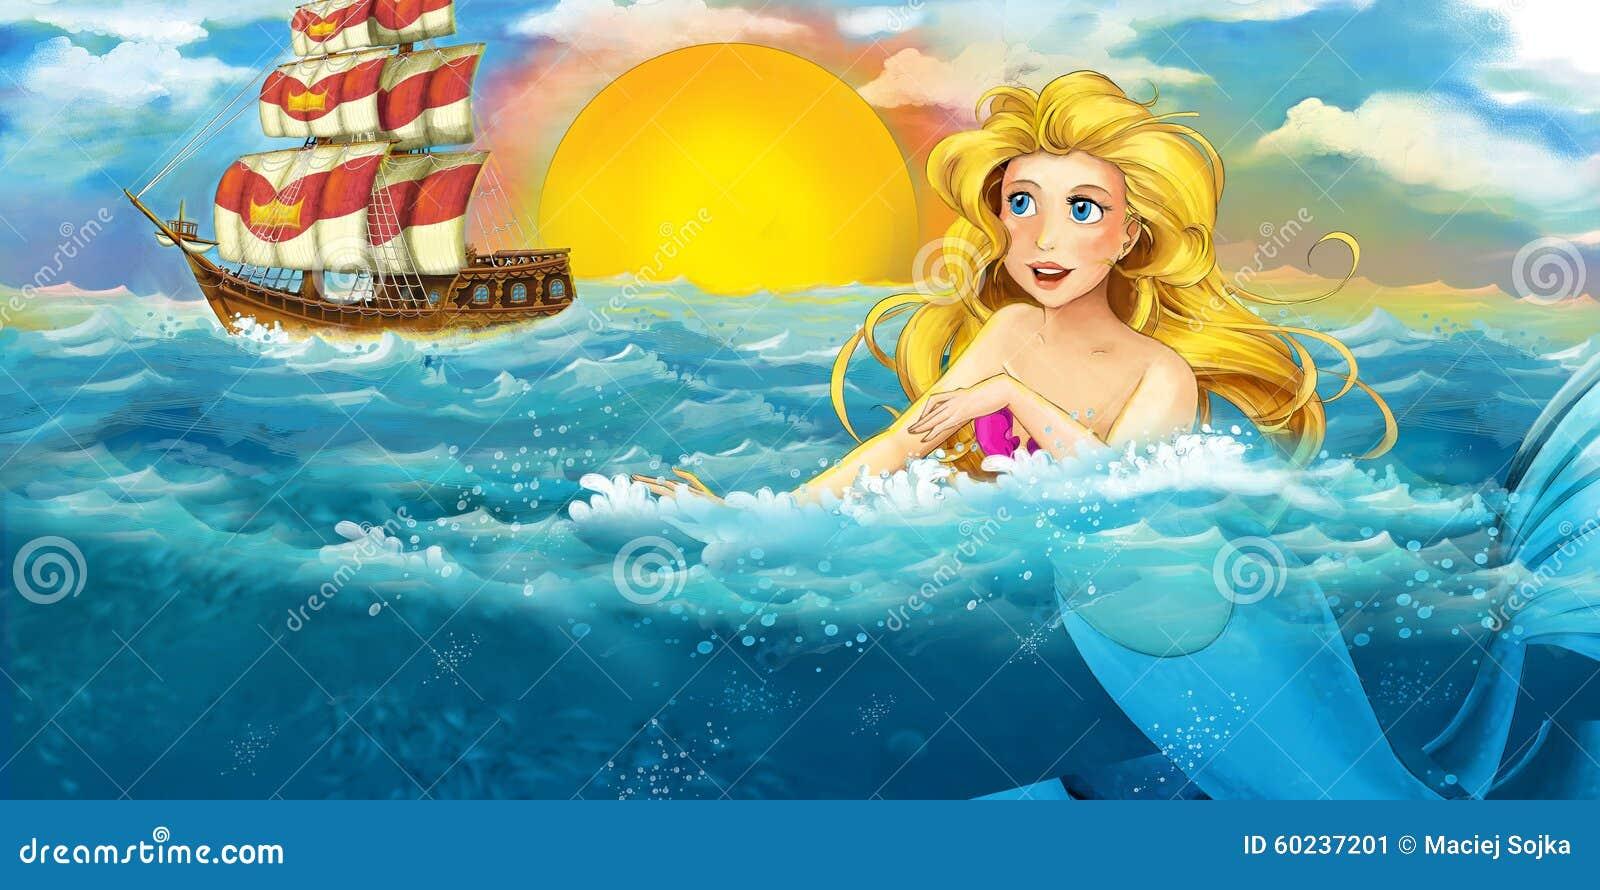 Cartoon ocean and the mermaid